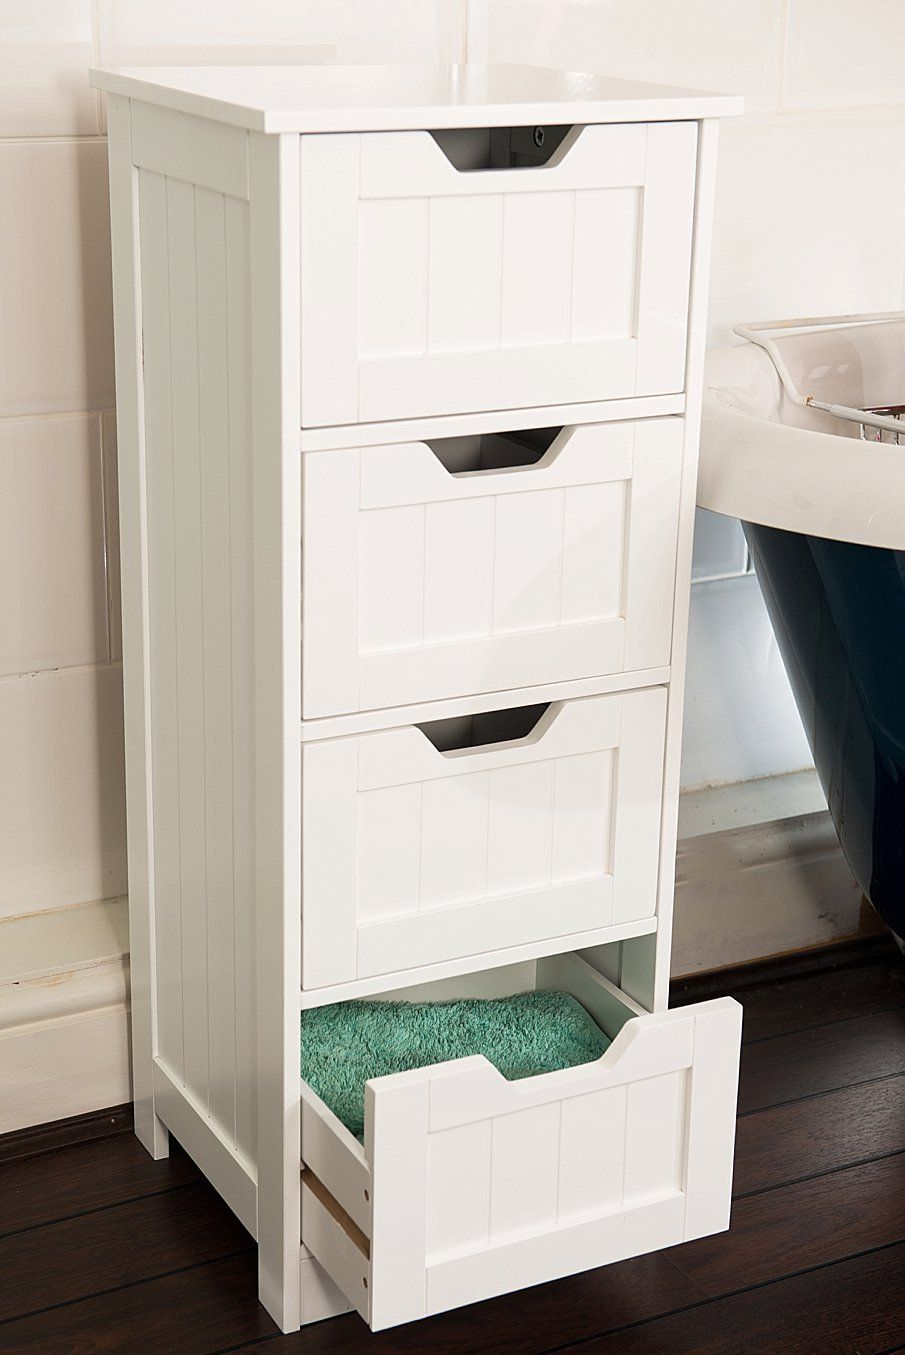 White Storage 4 Large Drawers. Bathroom Or